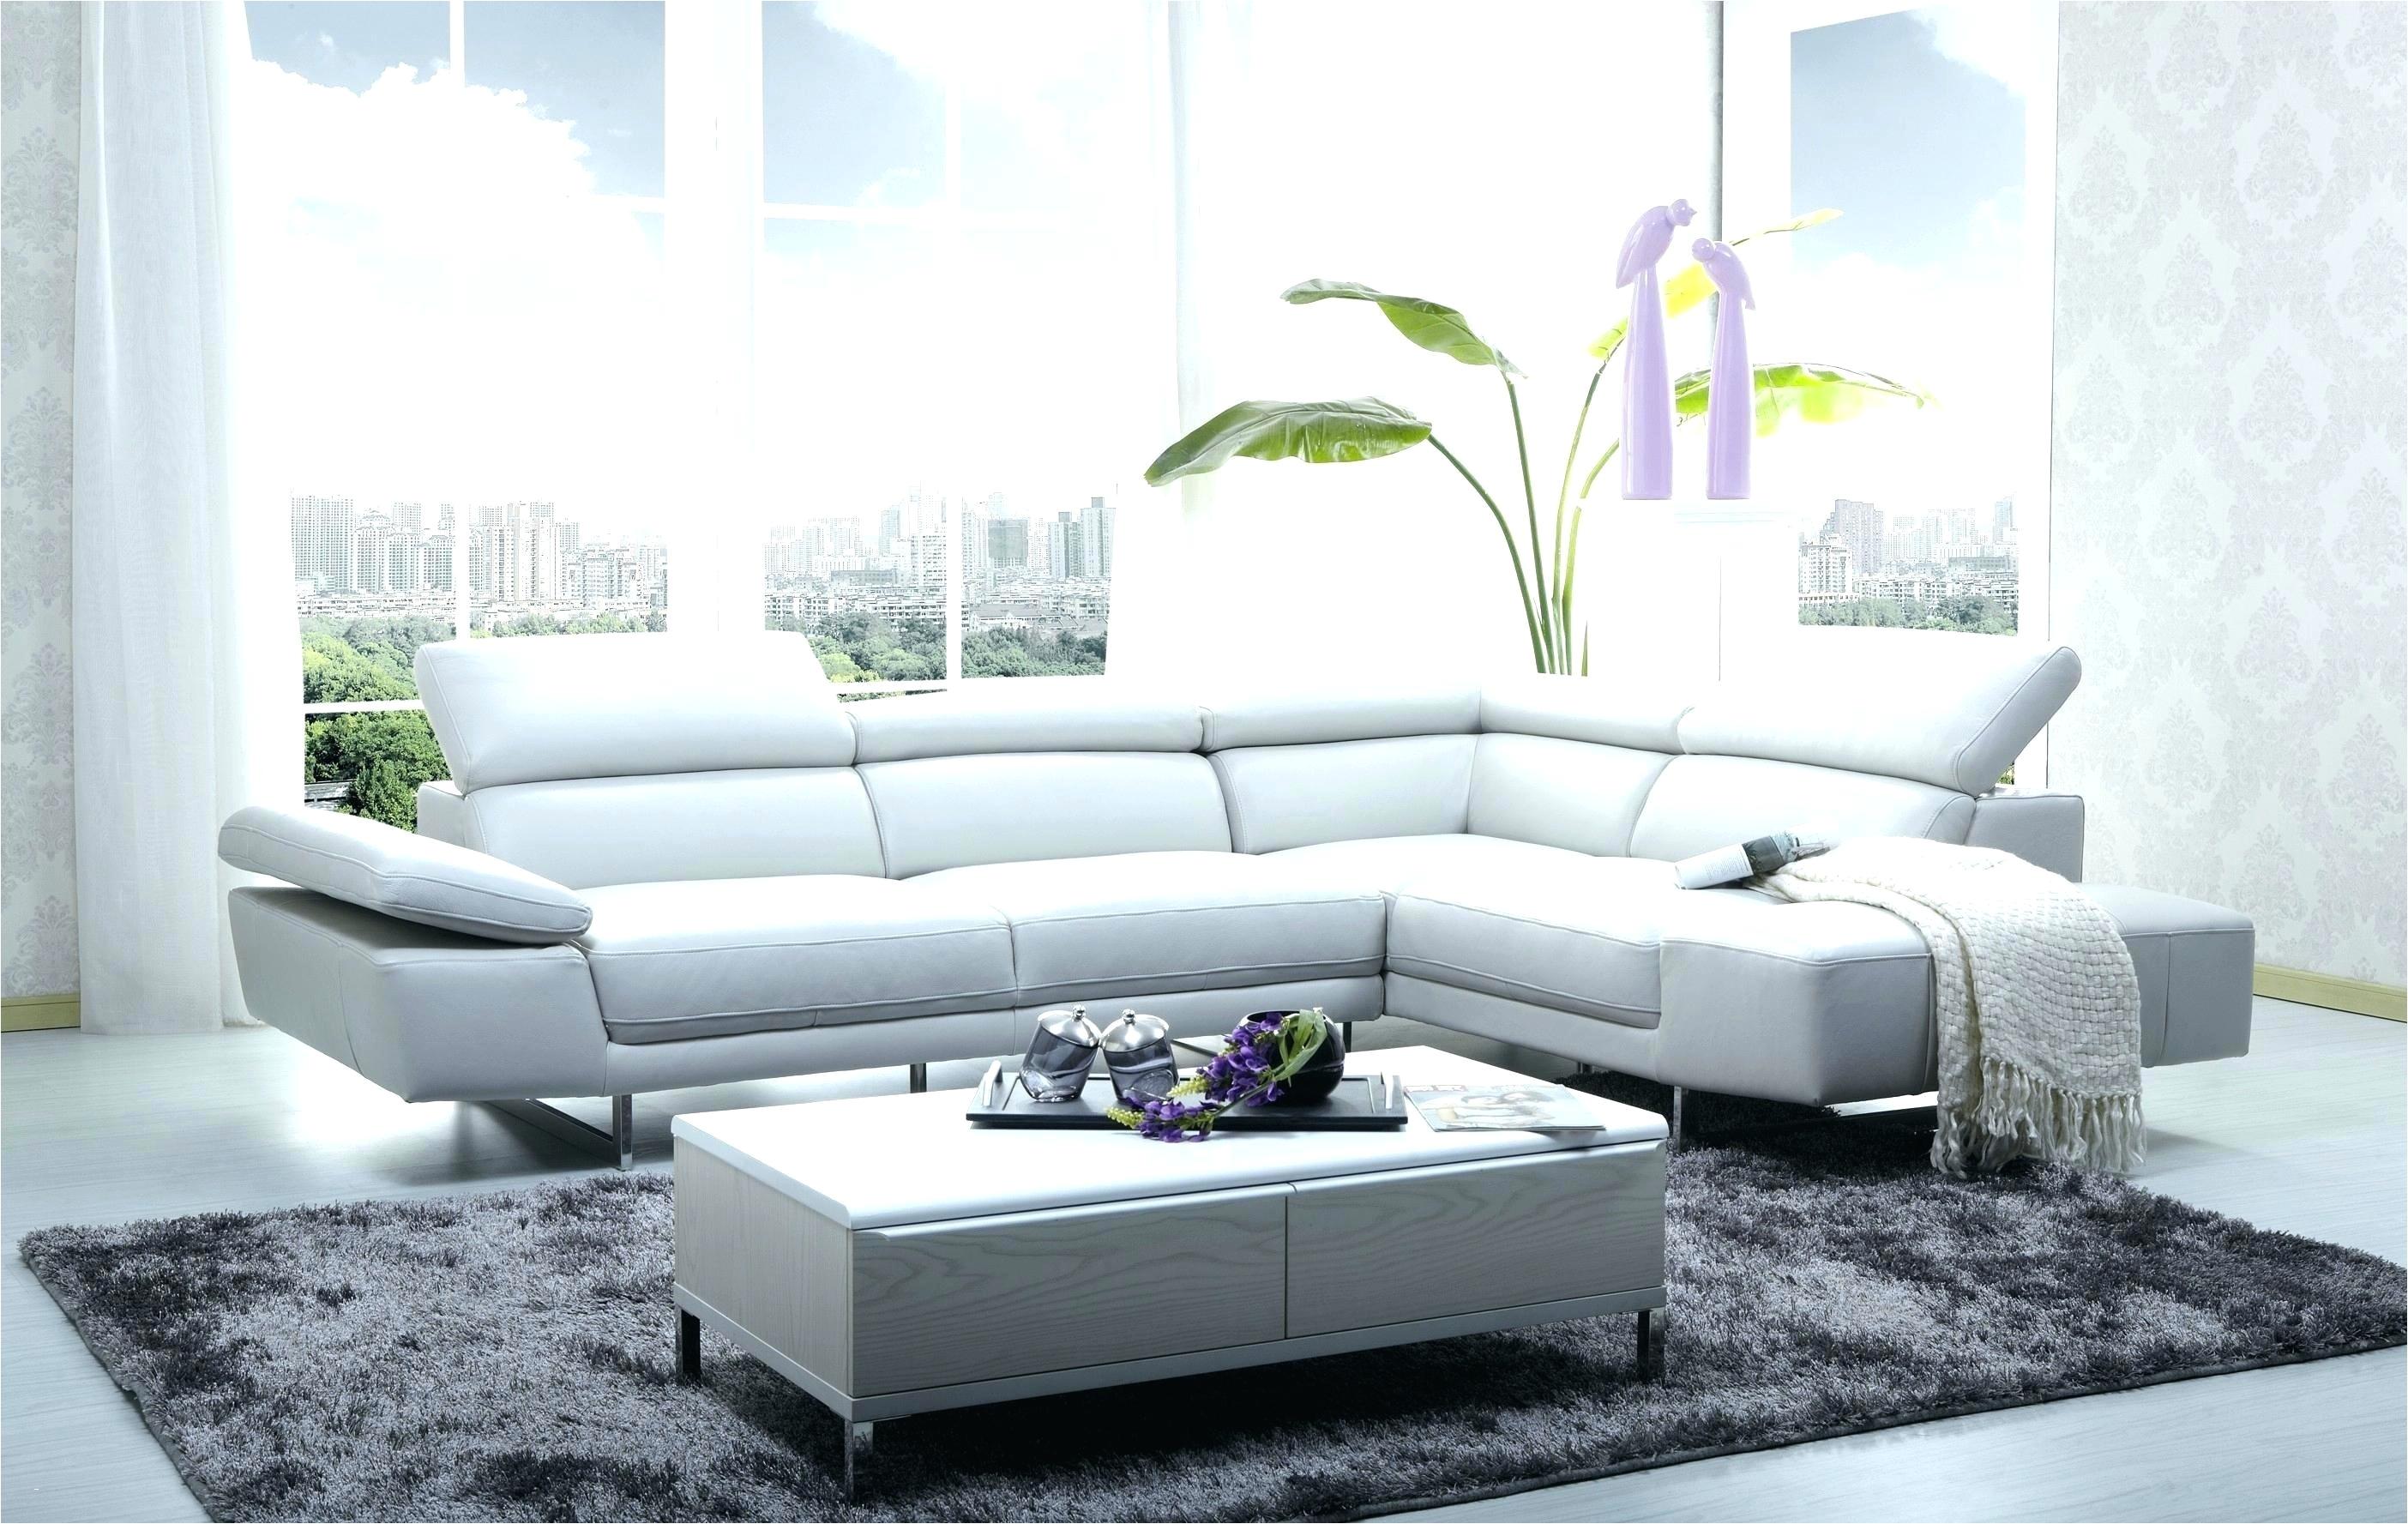 awesome sofa city springfield mo 26 amazing sofa city springfield mo sofa ideas